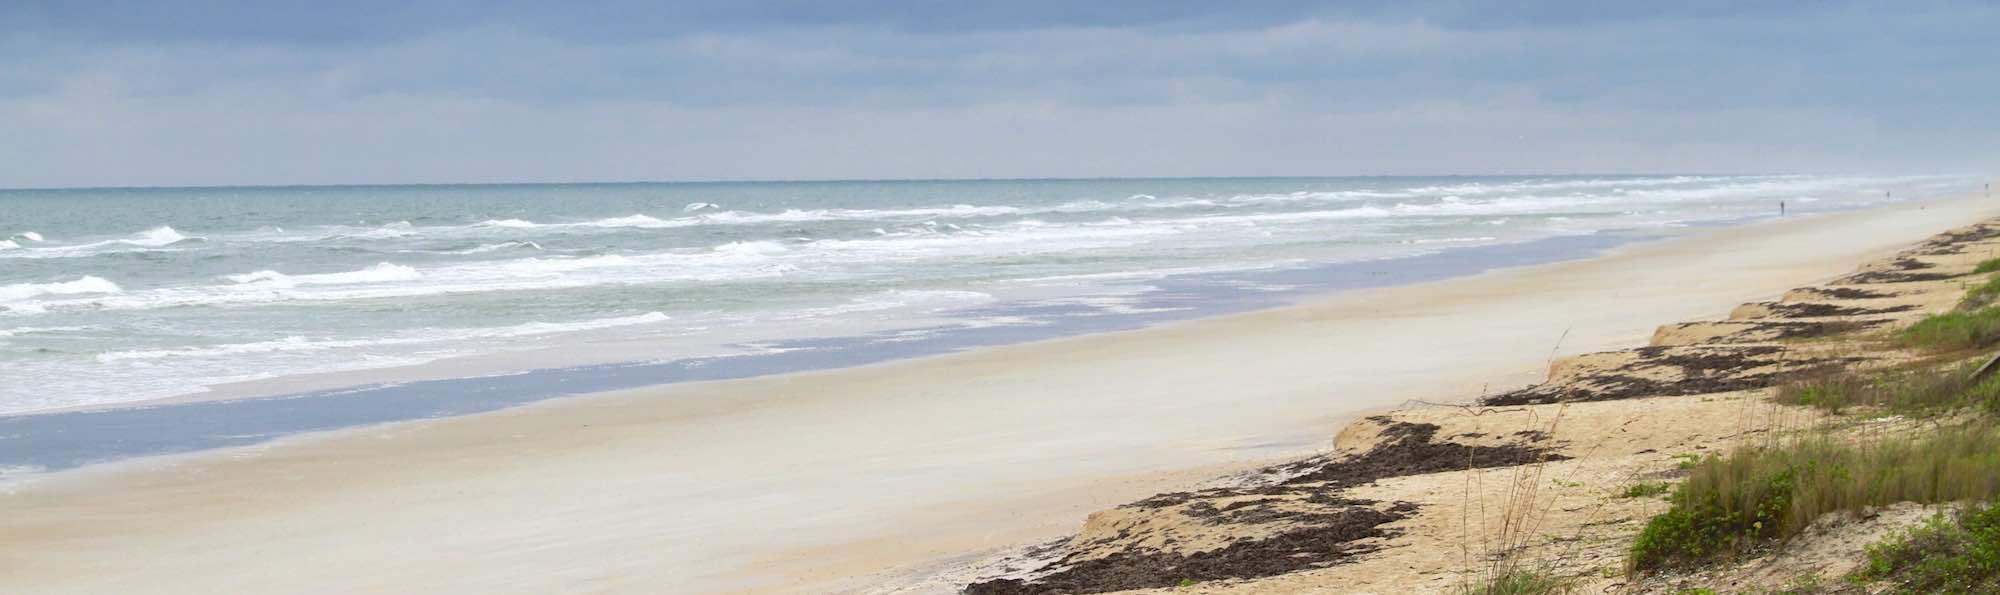 Barrier island beach scene